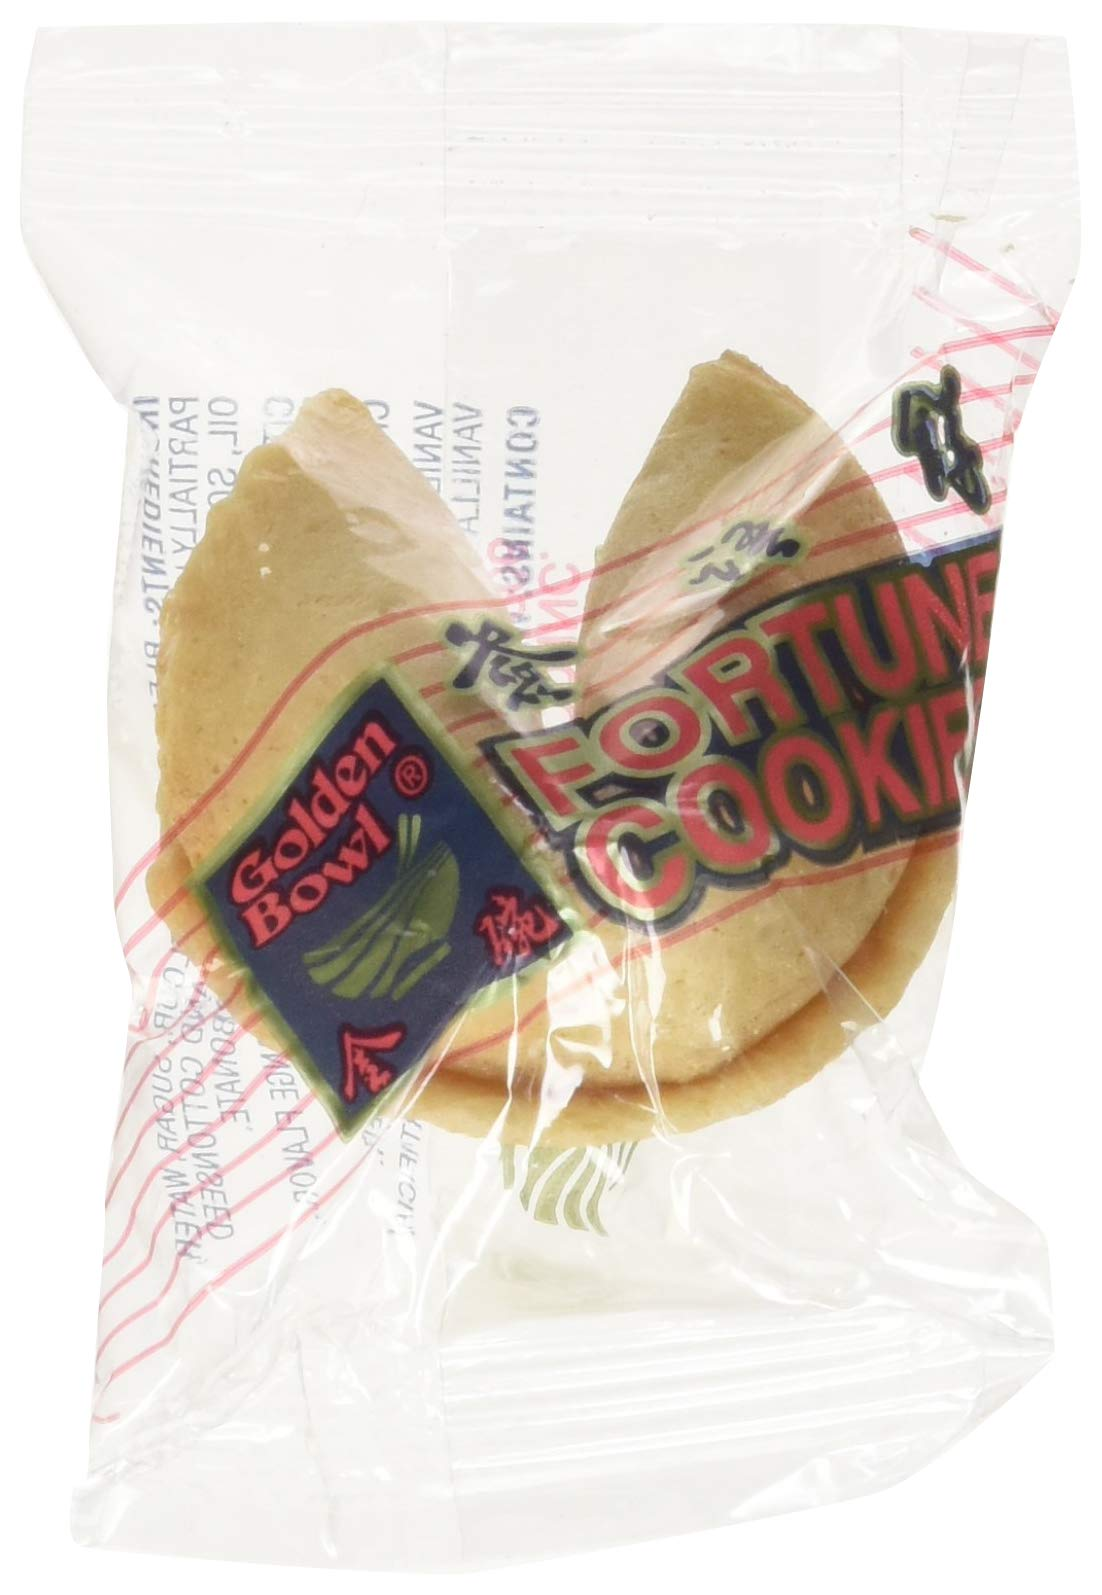 100 Pcs Fortune Cookies Fresh Single Wrap(golden Bowl) by Golden Bowl